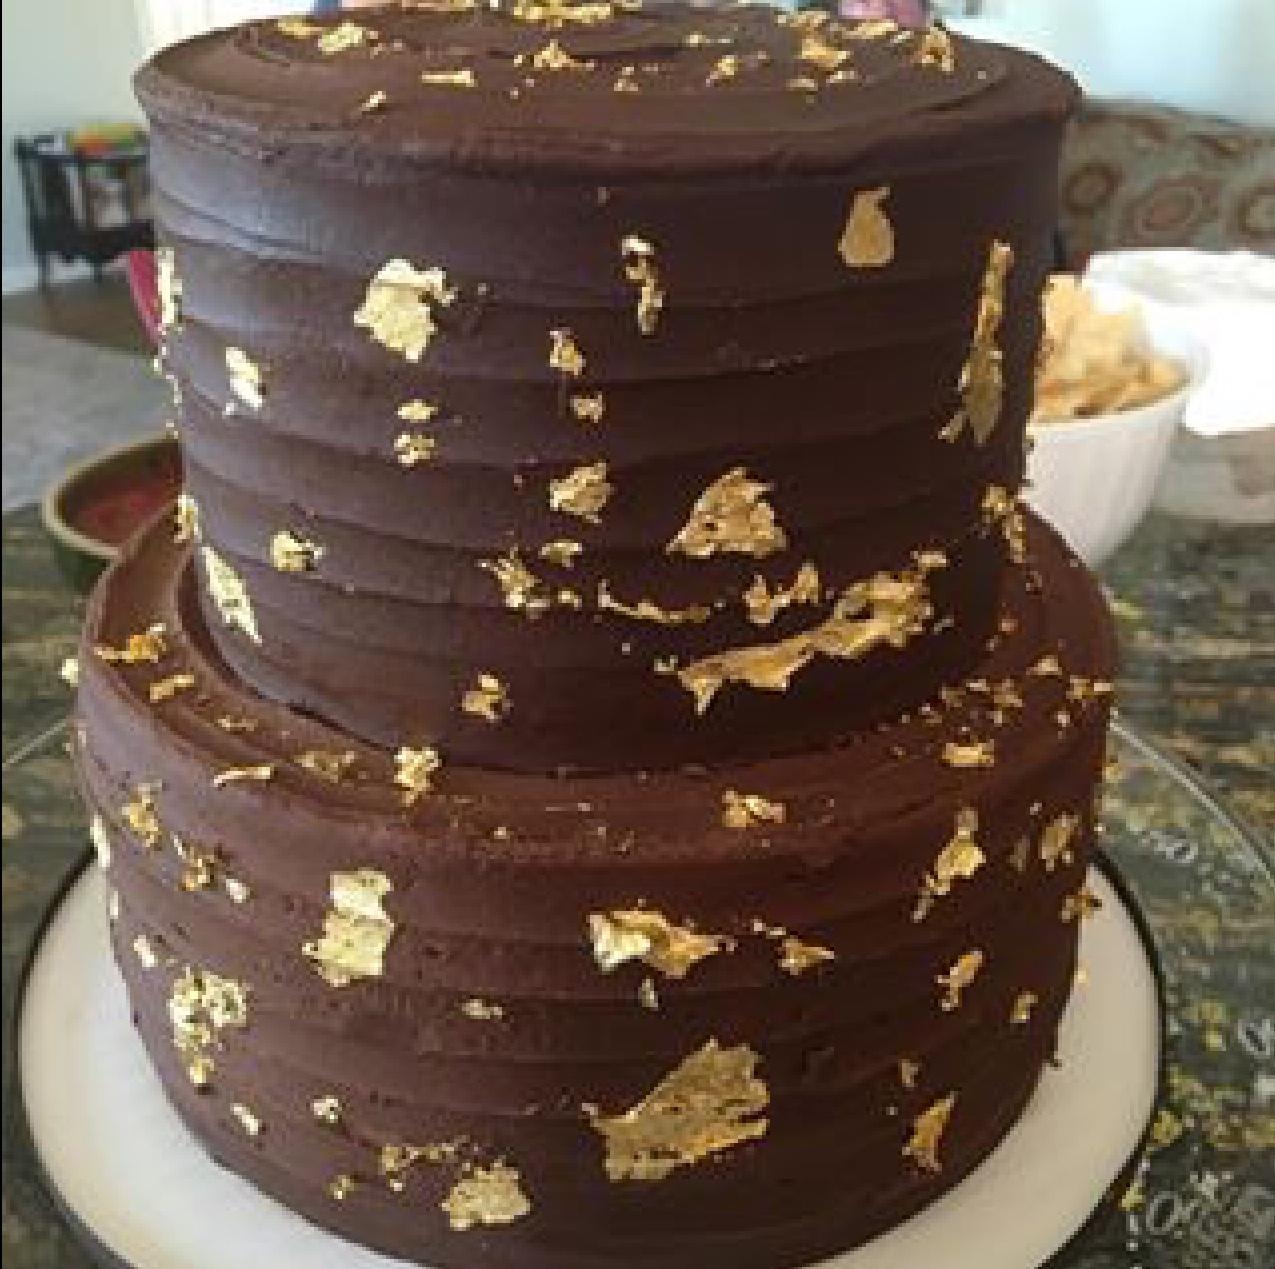 Chocolate with Gold Flecks